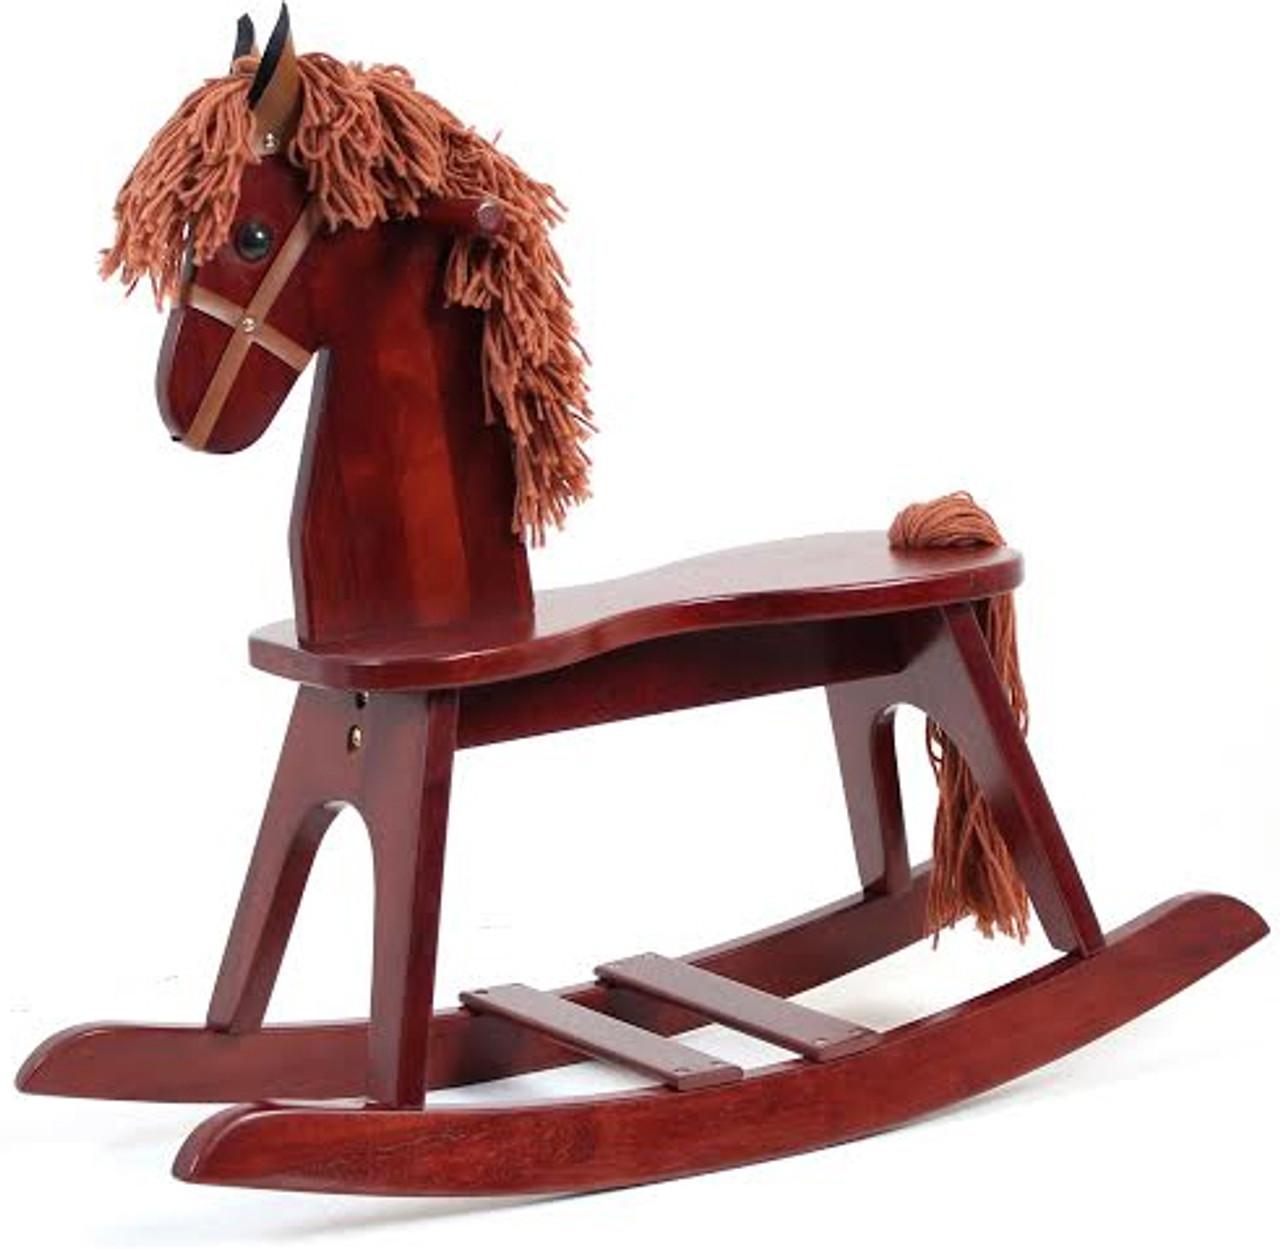 Sturdy Kids Rocking Horse Toy On Sale Free Pickup Melbourne